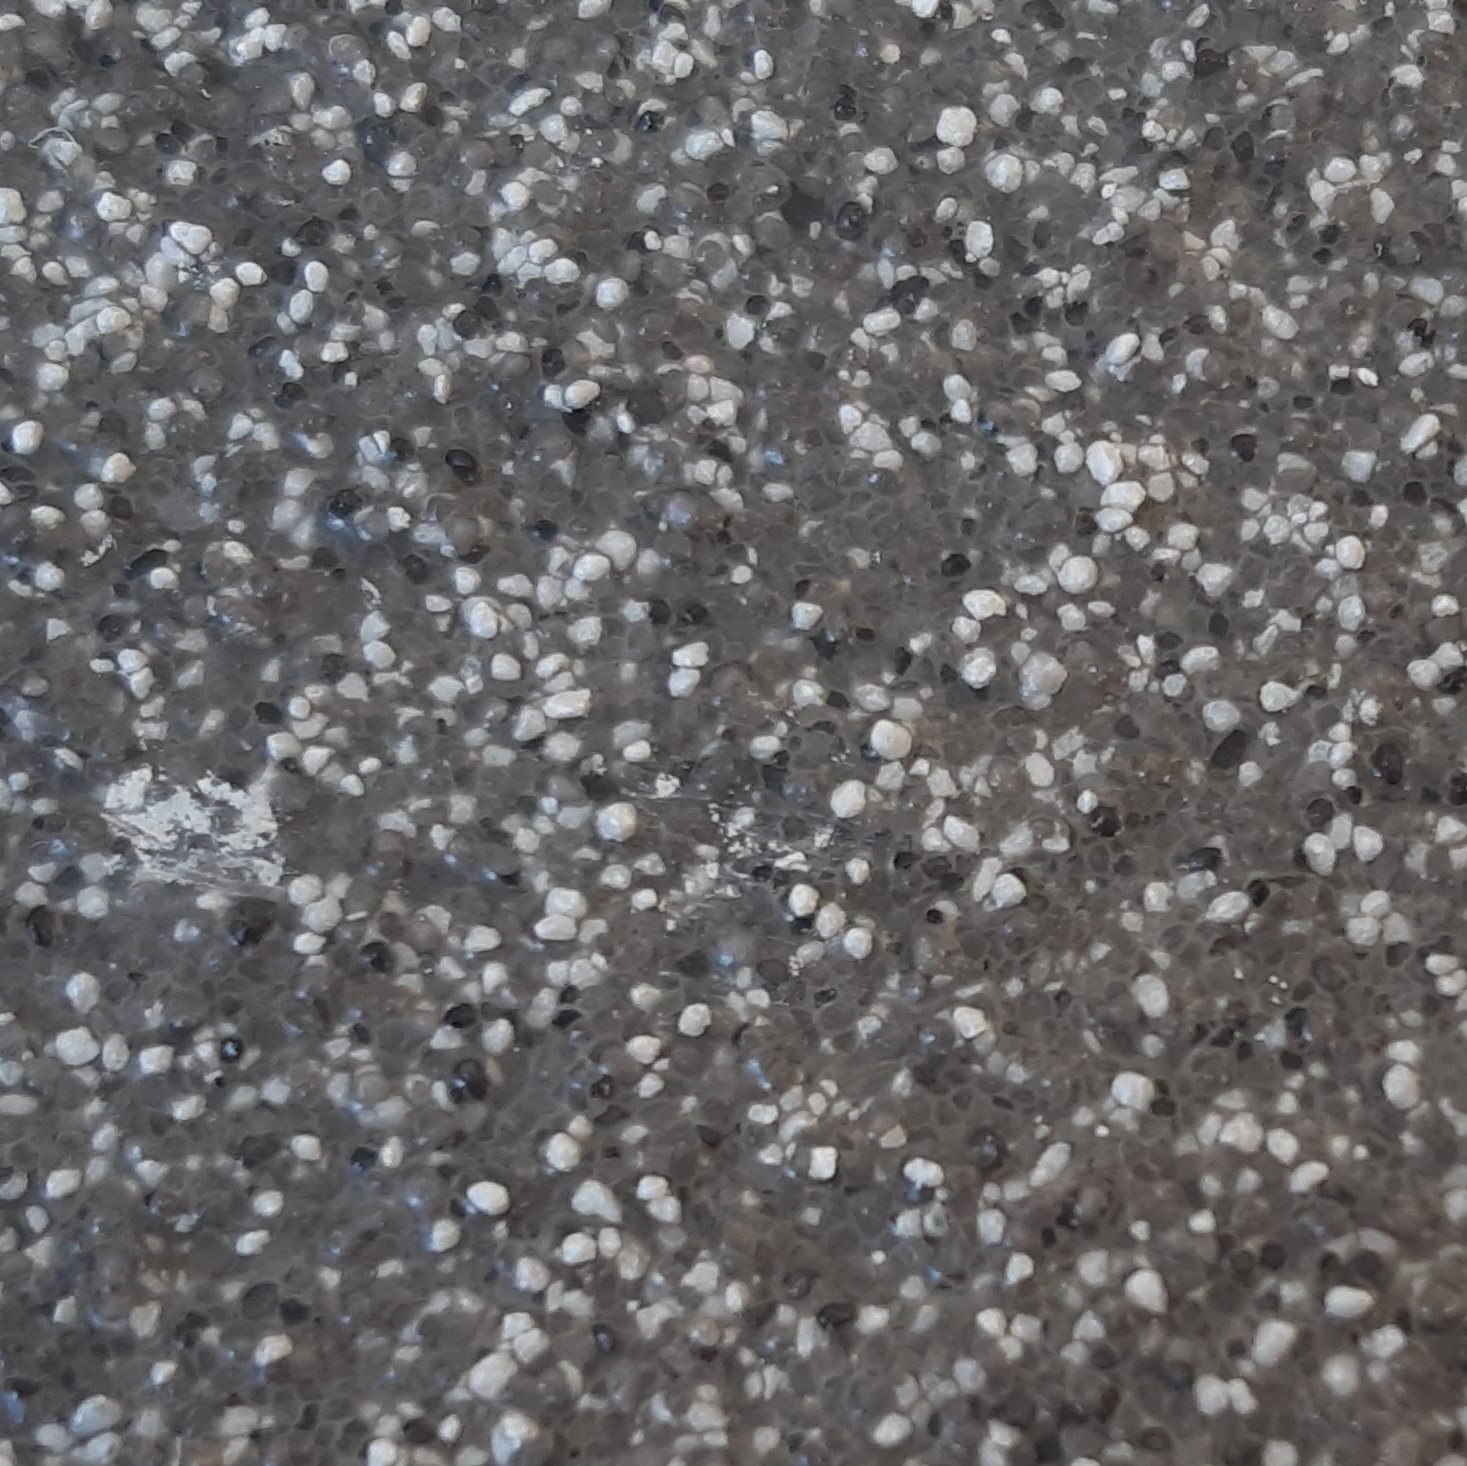 Quartz Trowelled Seal Grey